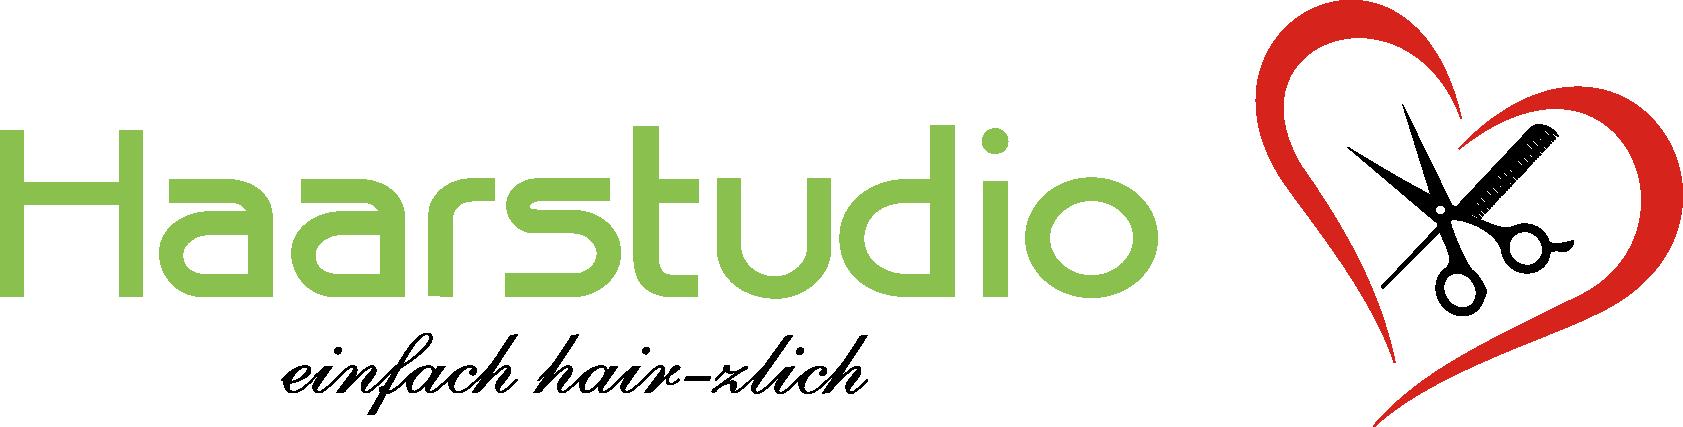 logo2@8x - Haarstudio - Friseurs in Rüdnitz